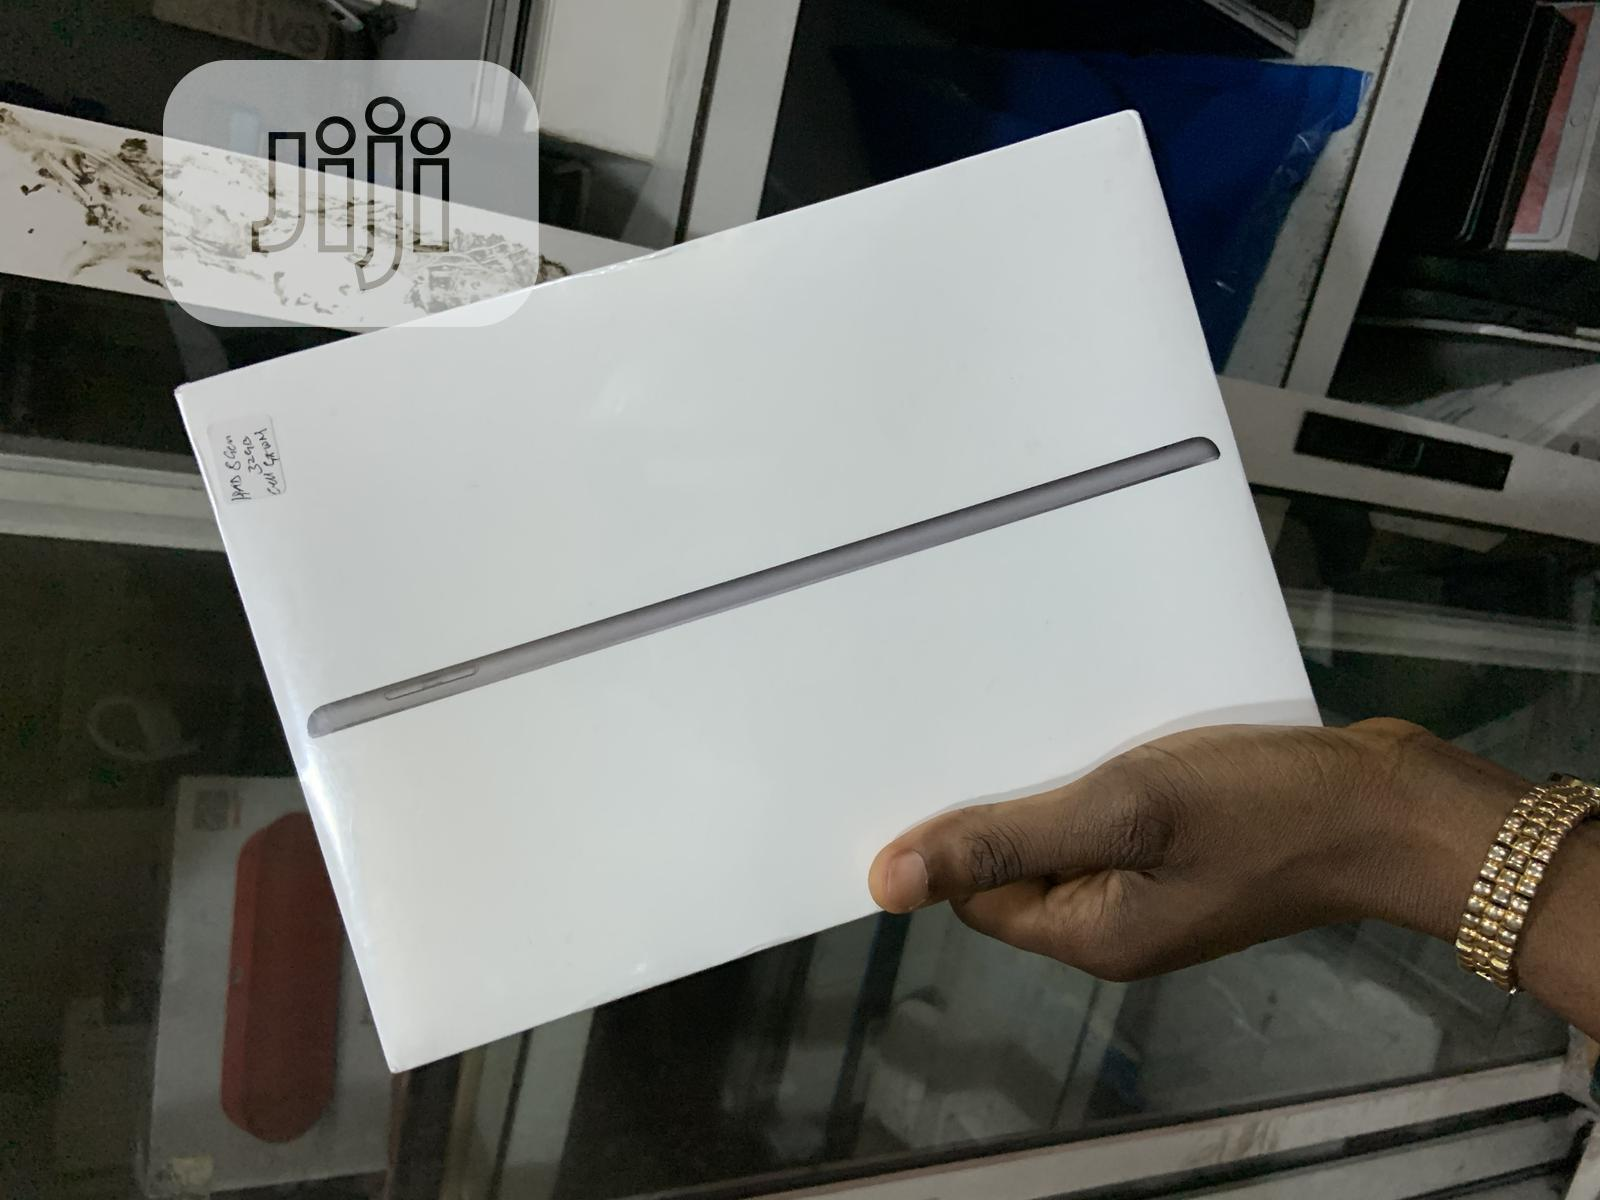 New Apple iPad 10.2 (2020) 32 GB